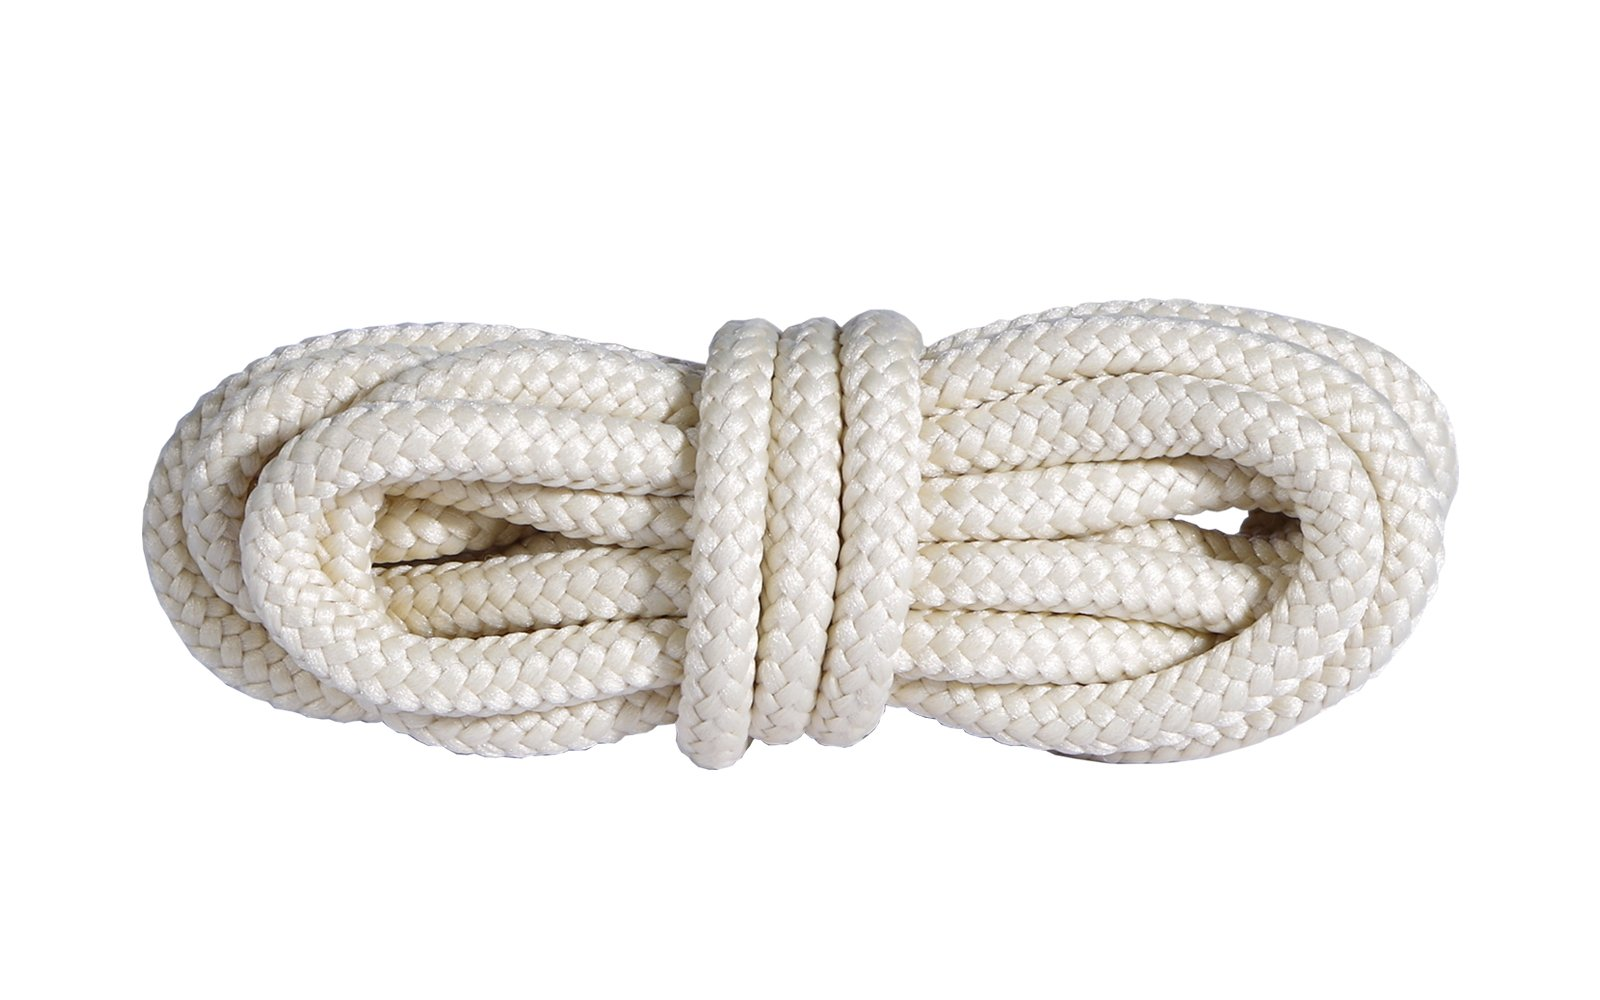 Шнурки для взуття Mountval Laces 150 см, Цвет шнурков: Бежевый, фото